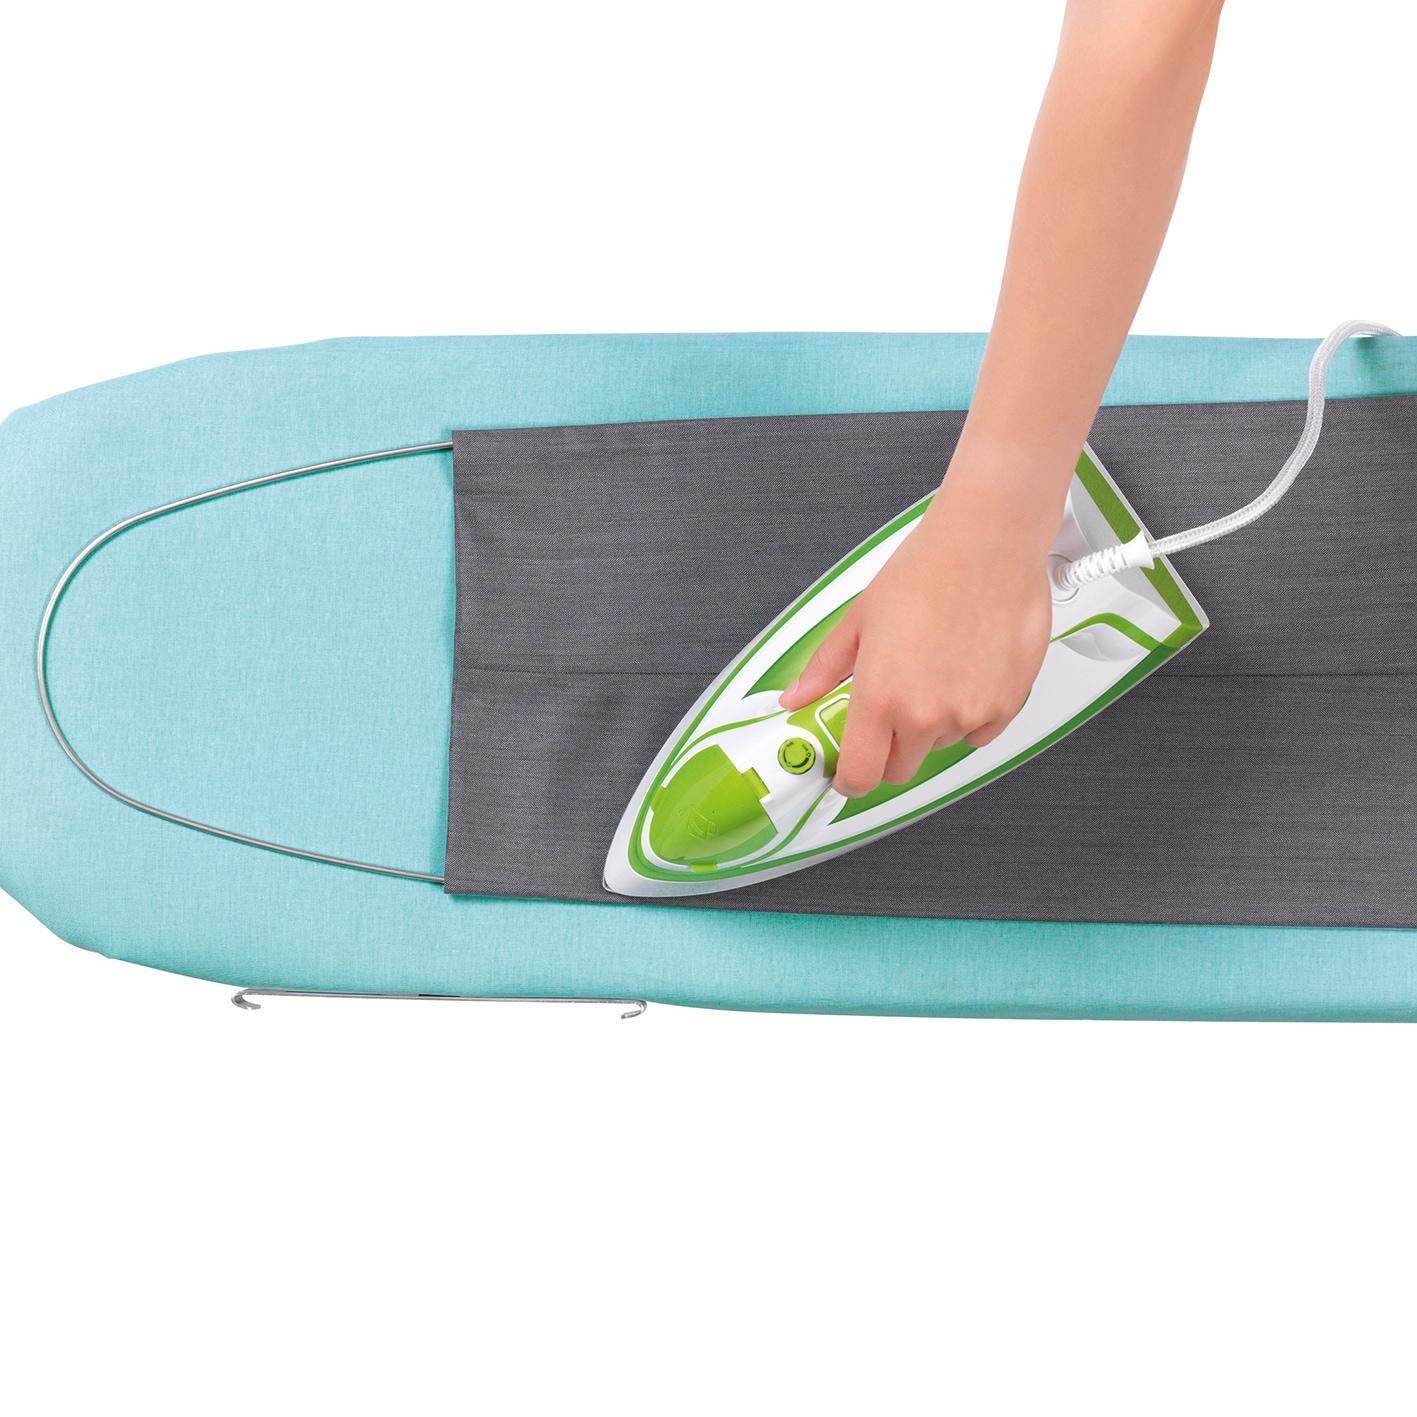 Bügelhilfe Bügel-Clou 800 mm Edelstahl für Hosen